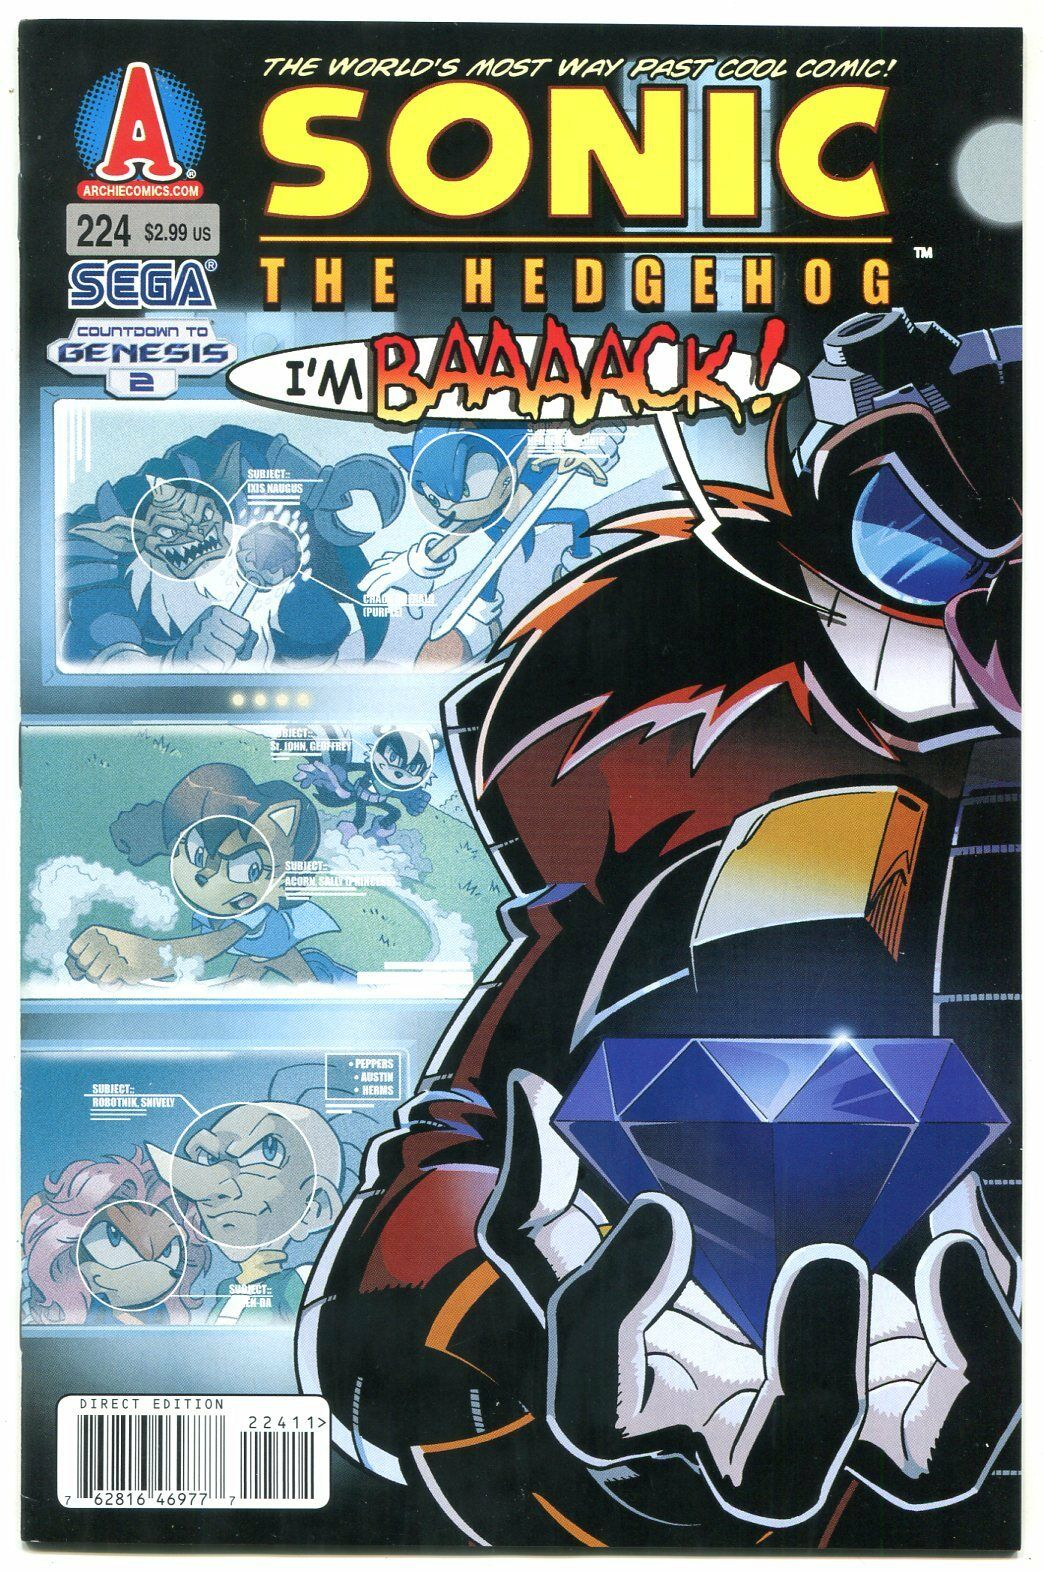 Sonic The Hedgehog 224 2011 Archie Comics Sega Hipcomic